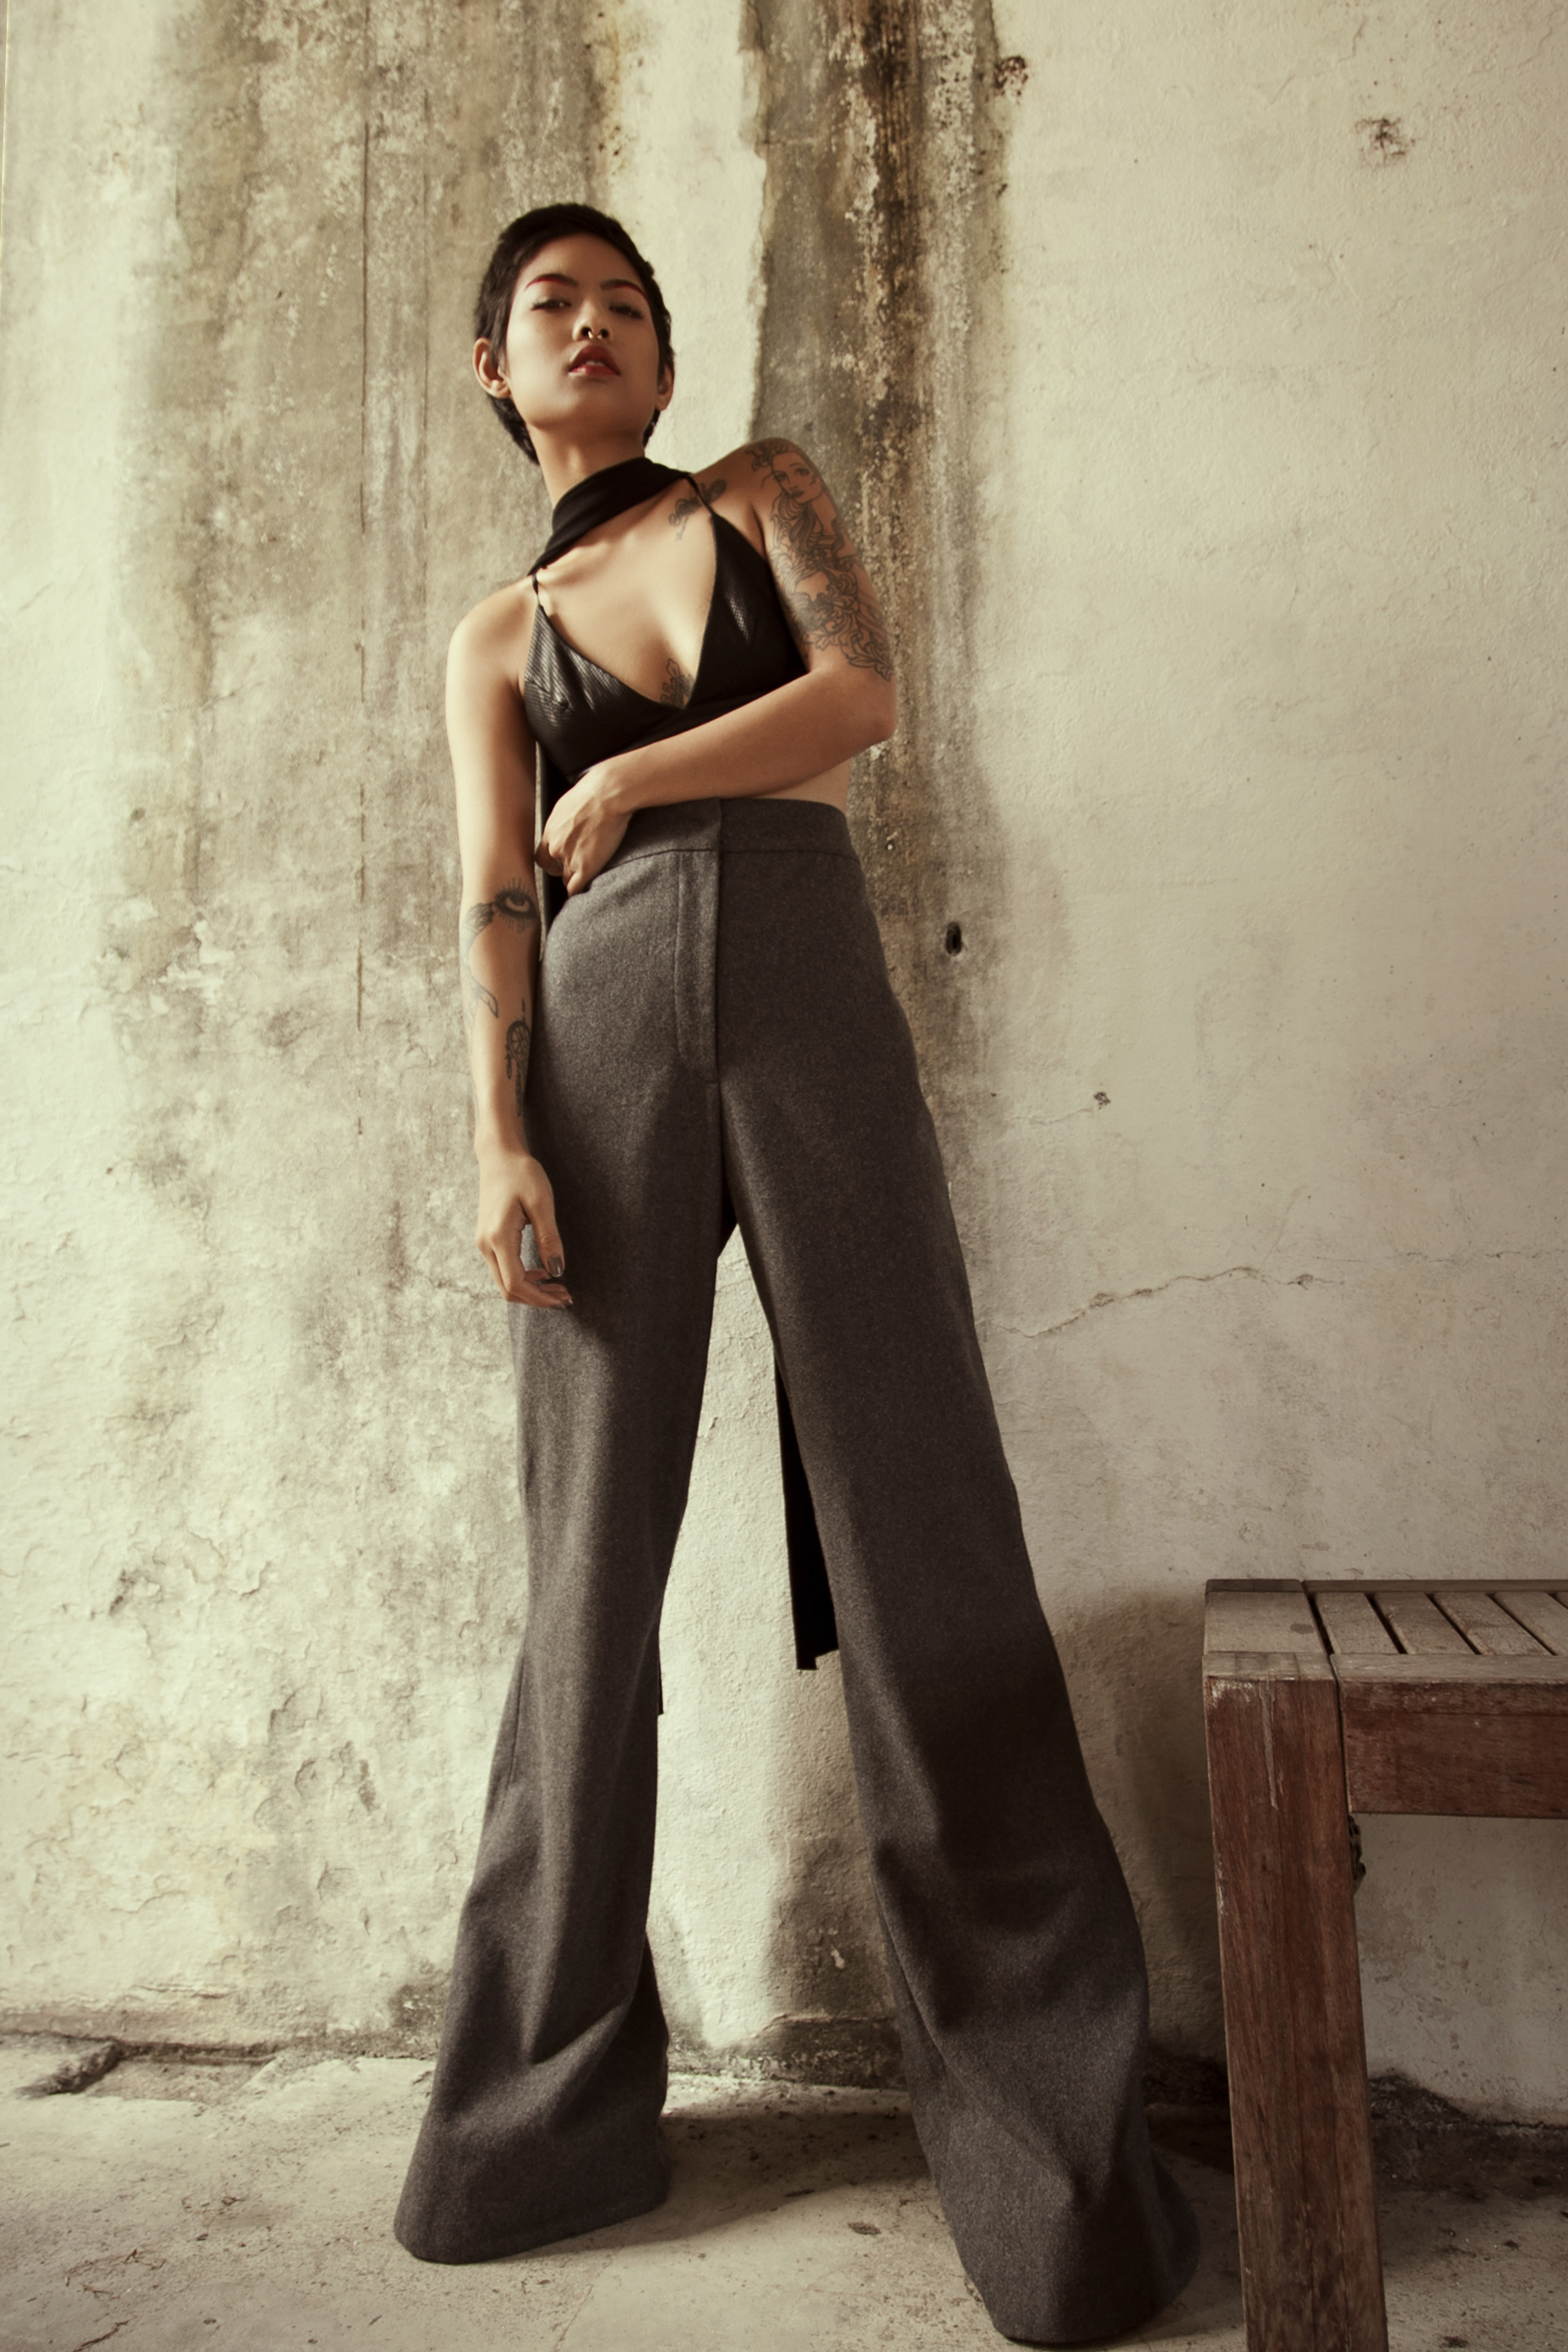 Bralette –Kaliver  Pants –Grammar  Shoes -Jeffery Campbell